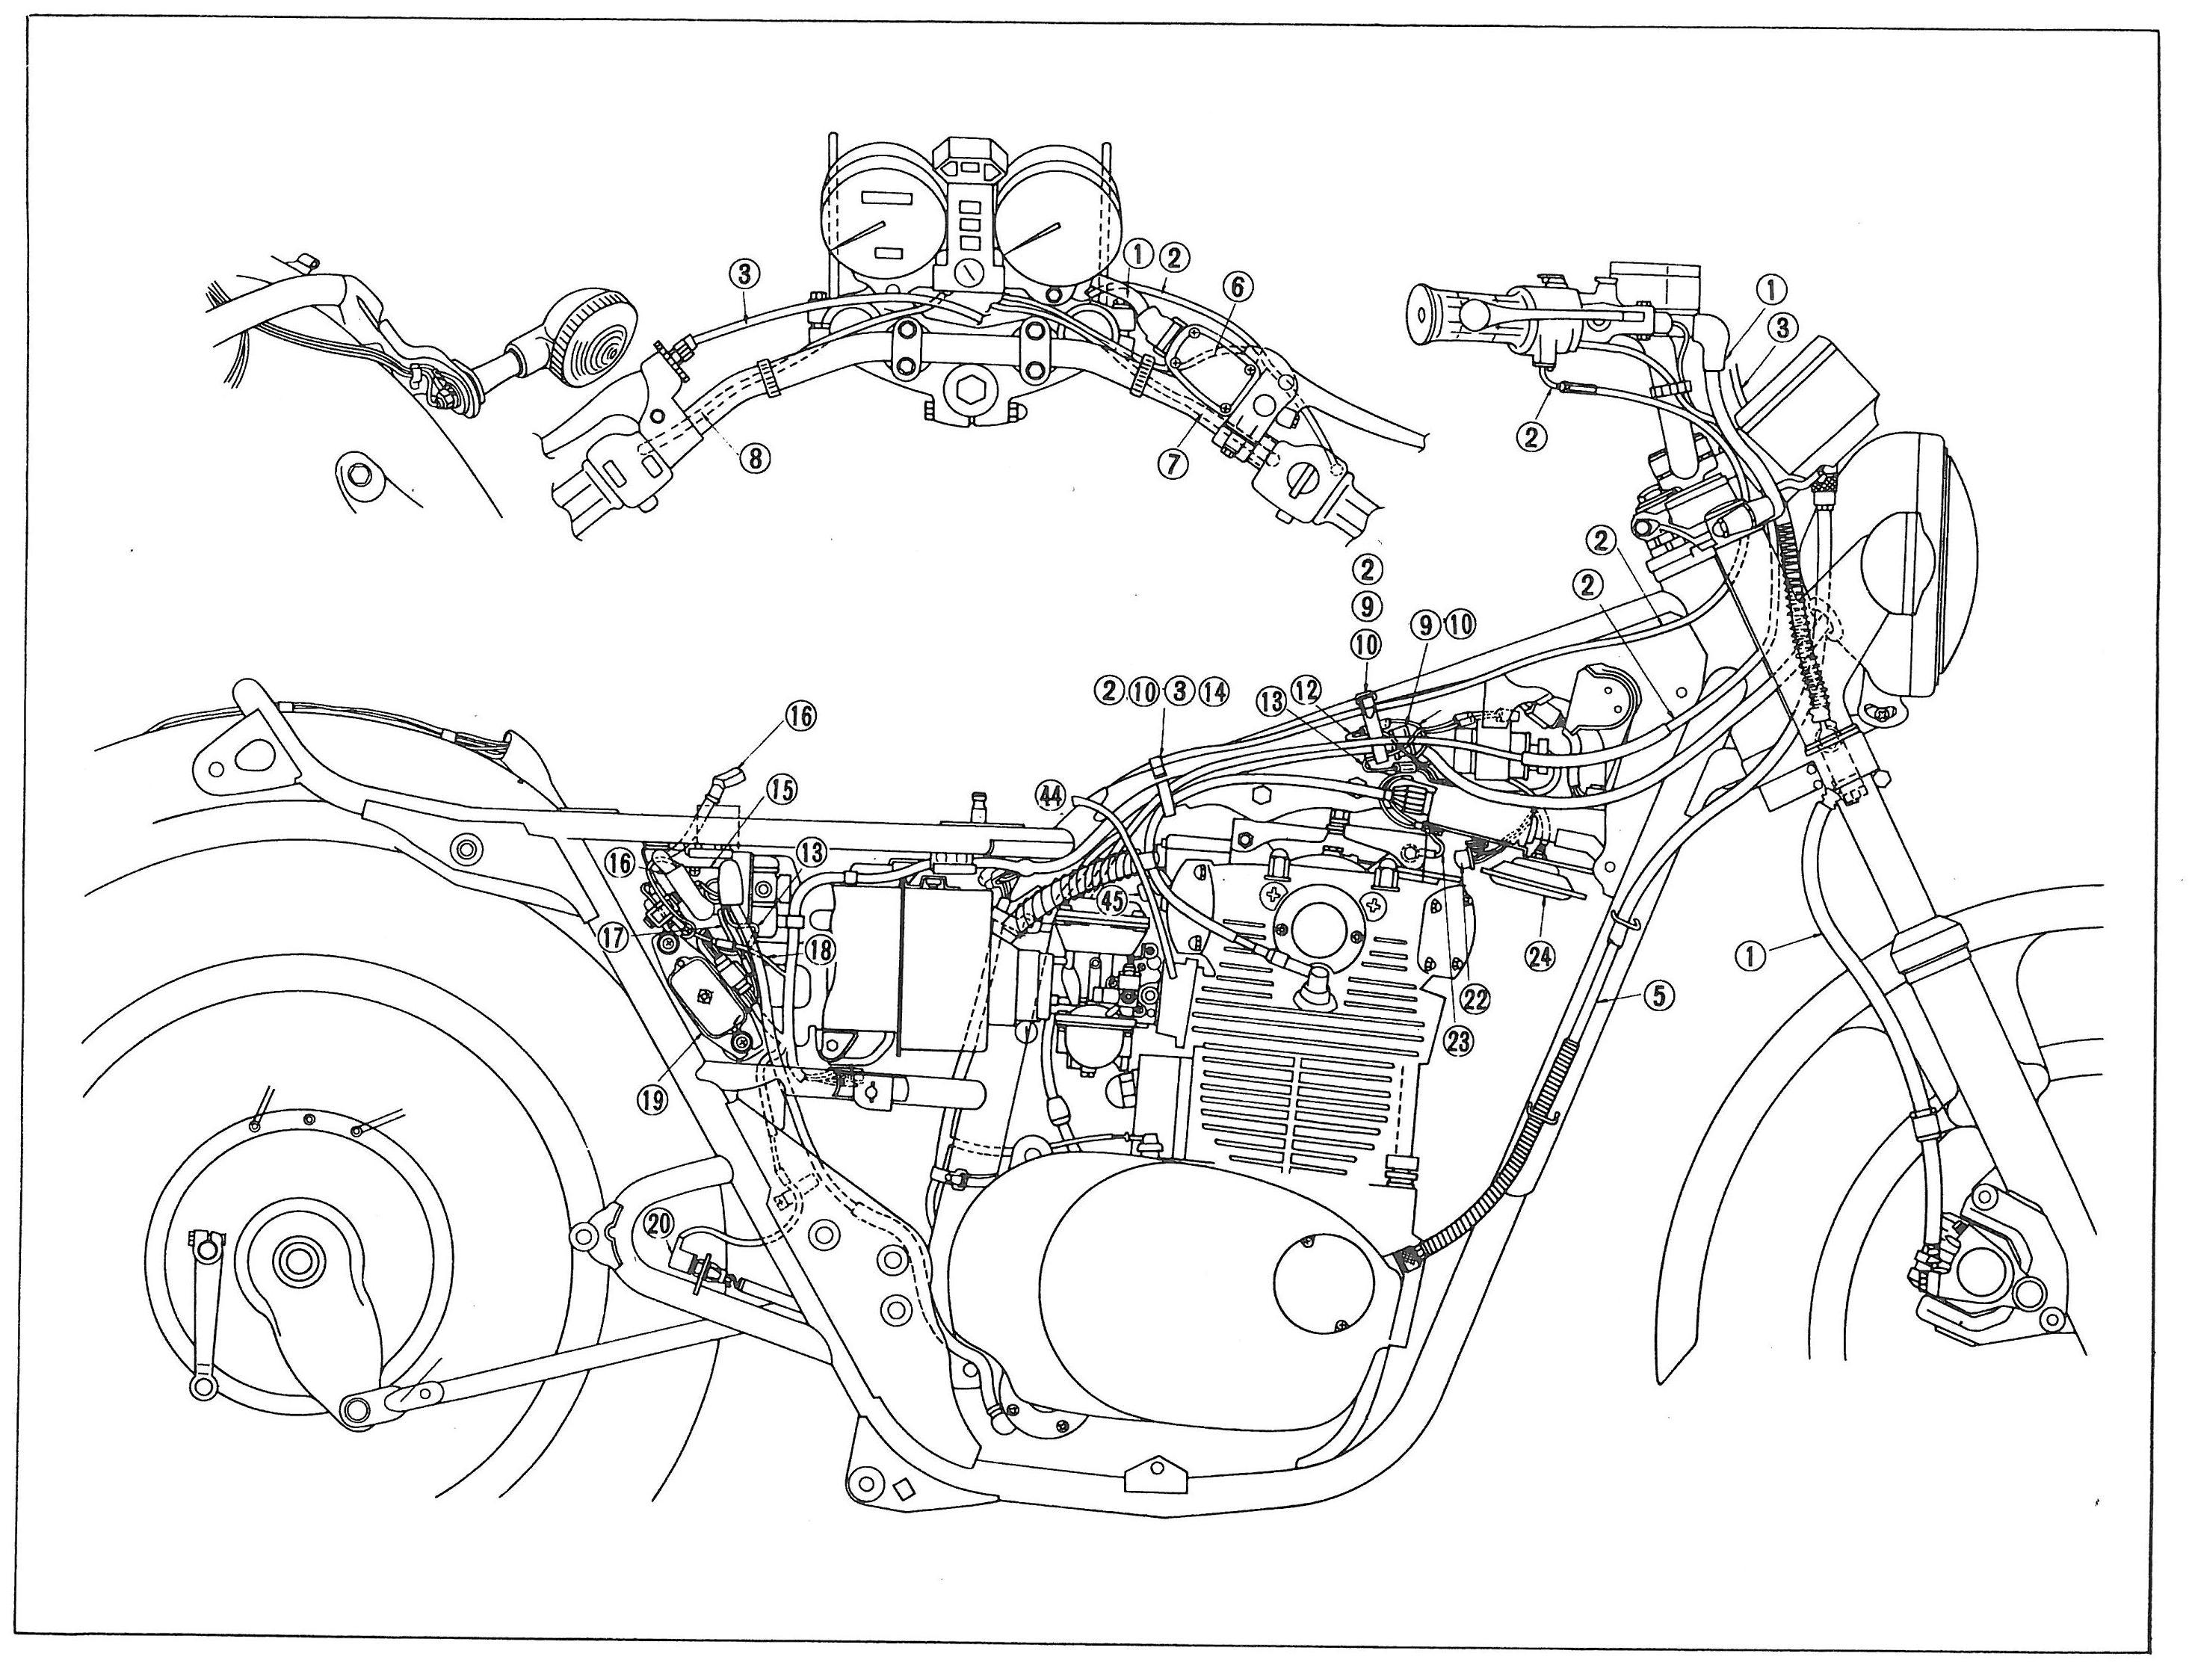 xs650 engine diagram wiring diagram toolbox 1981 xs650 engine diagram [ 2929 x 2248 Pixel ]